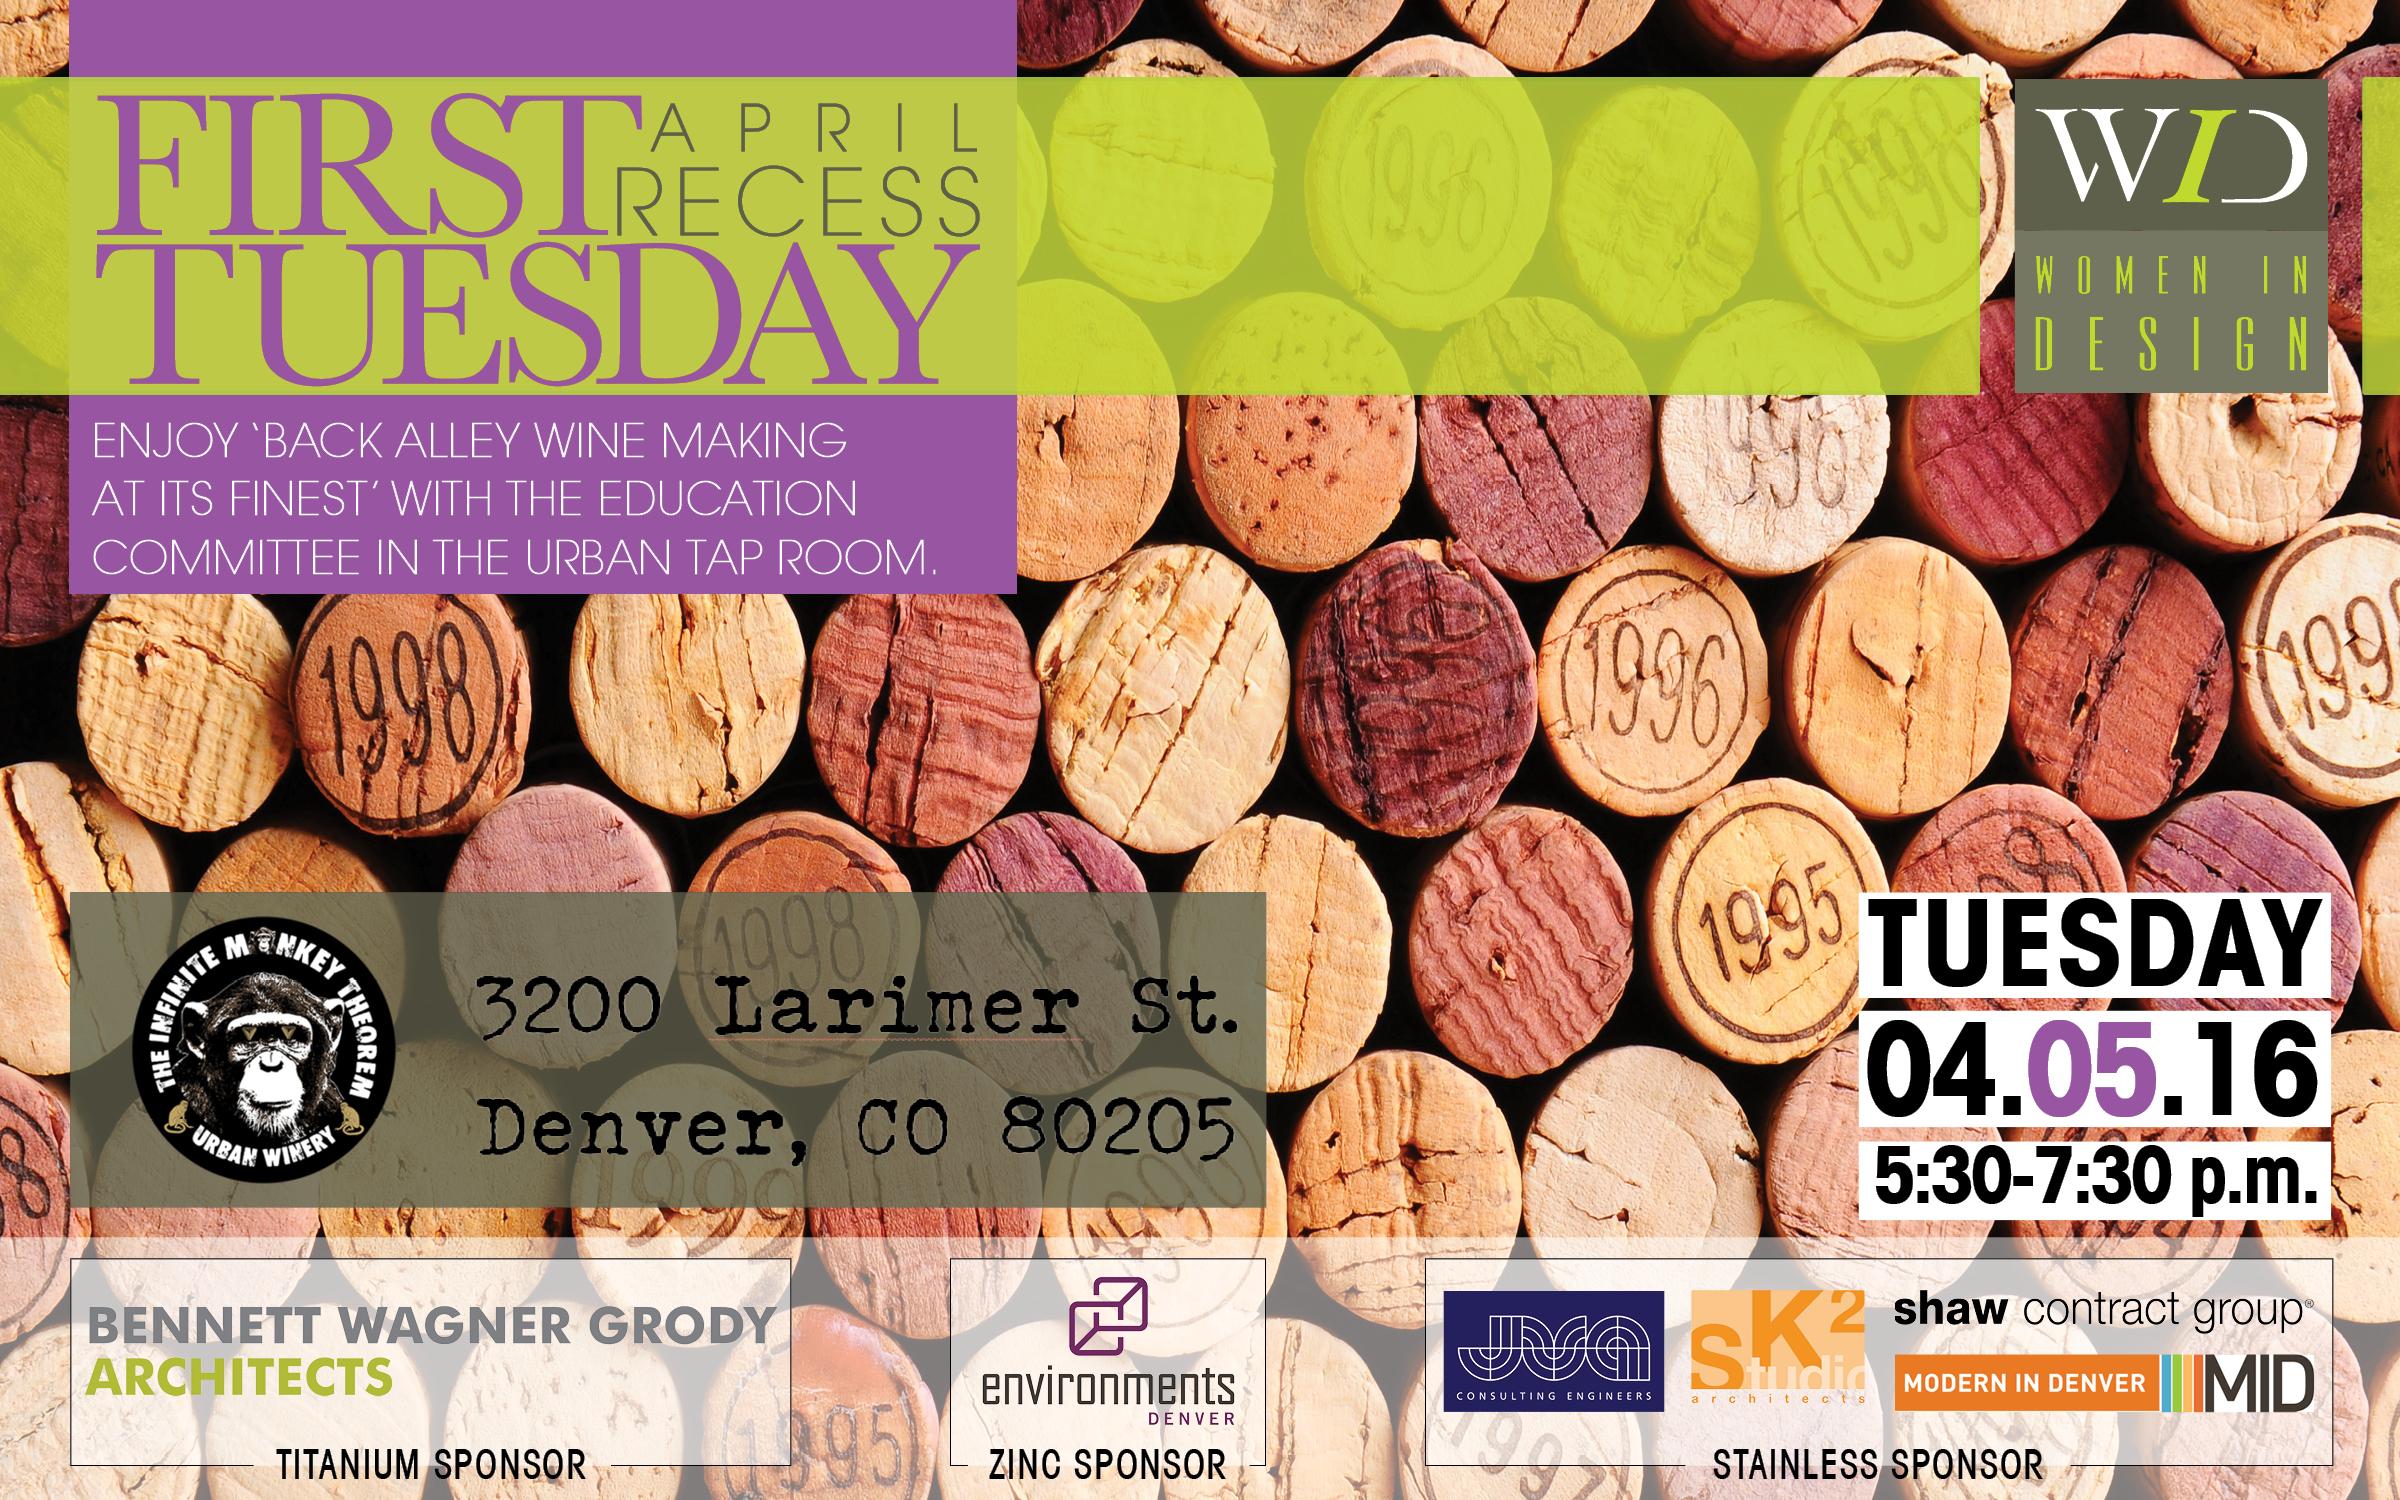 April First Tuesday Recess Flyer